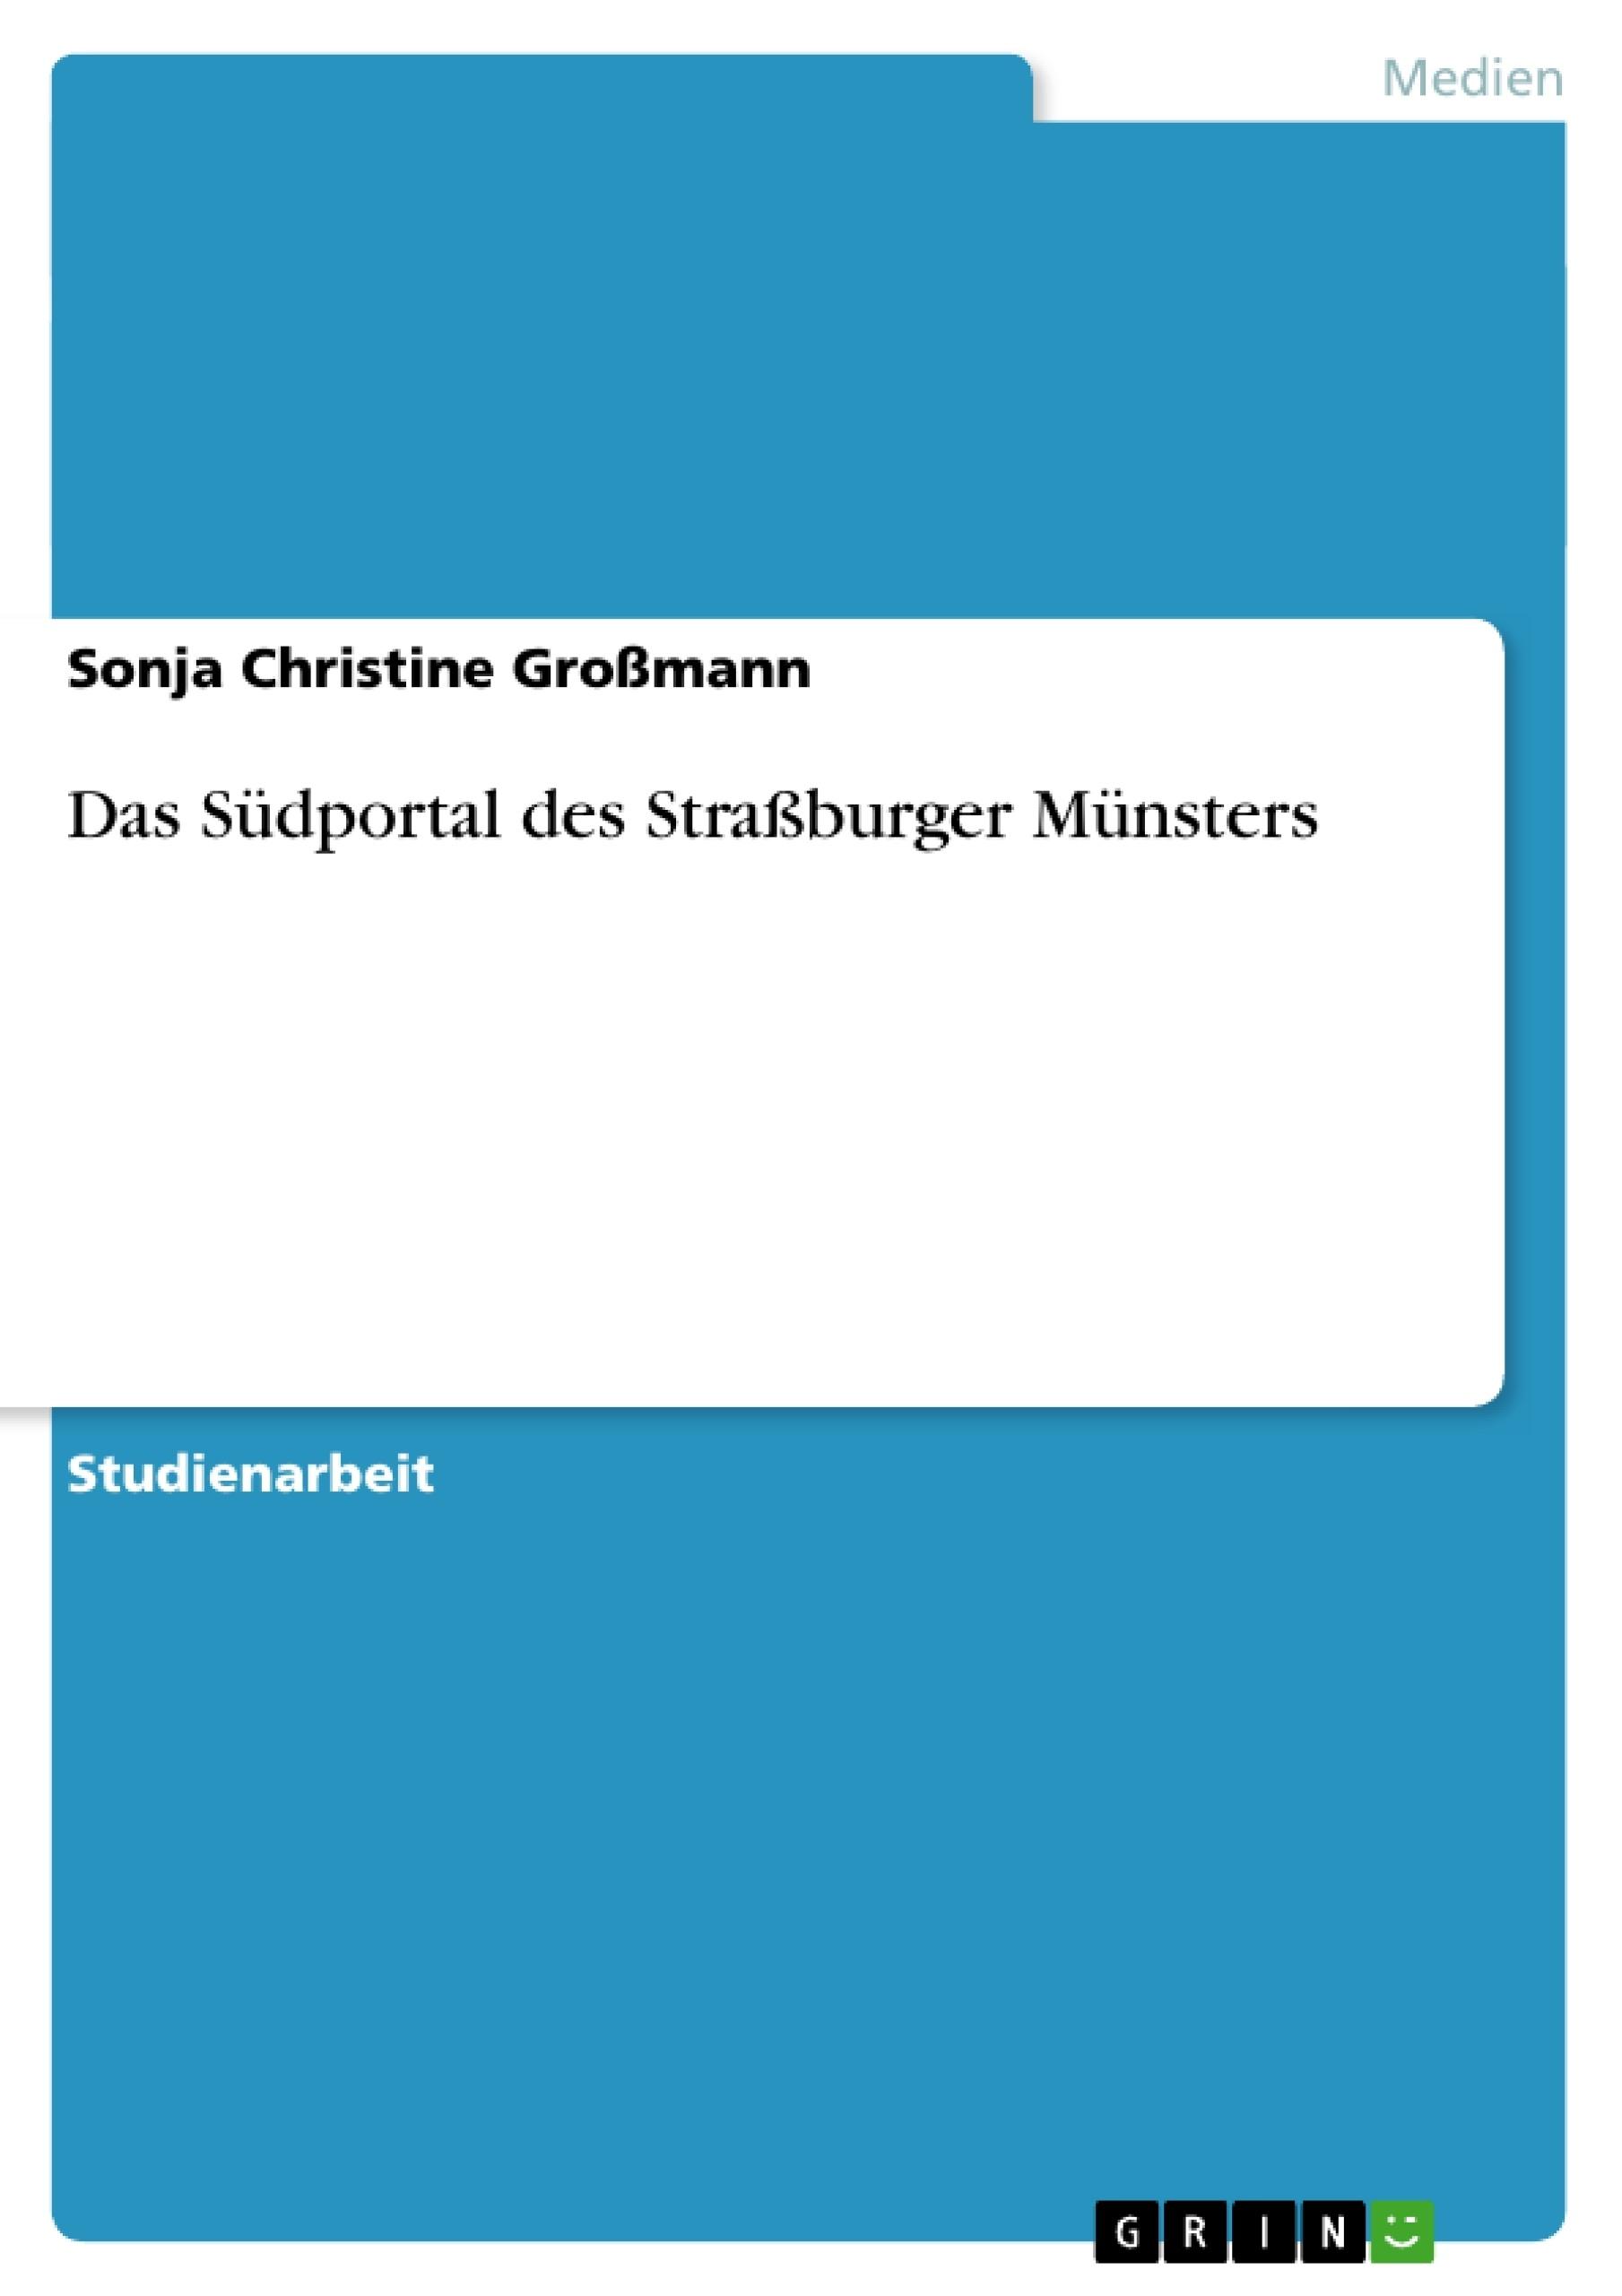 Titel: Das Südportal des Straßburger Münsters